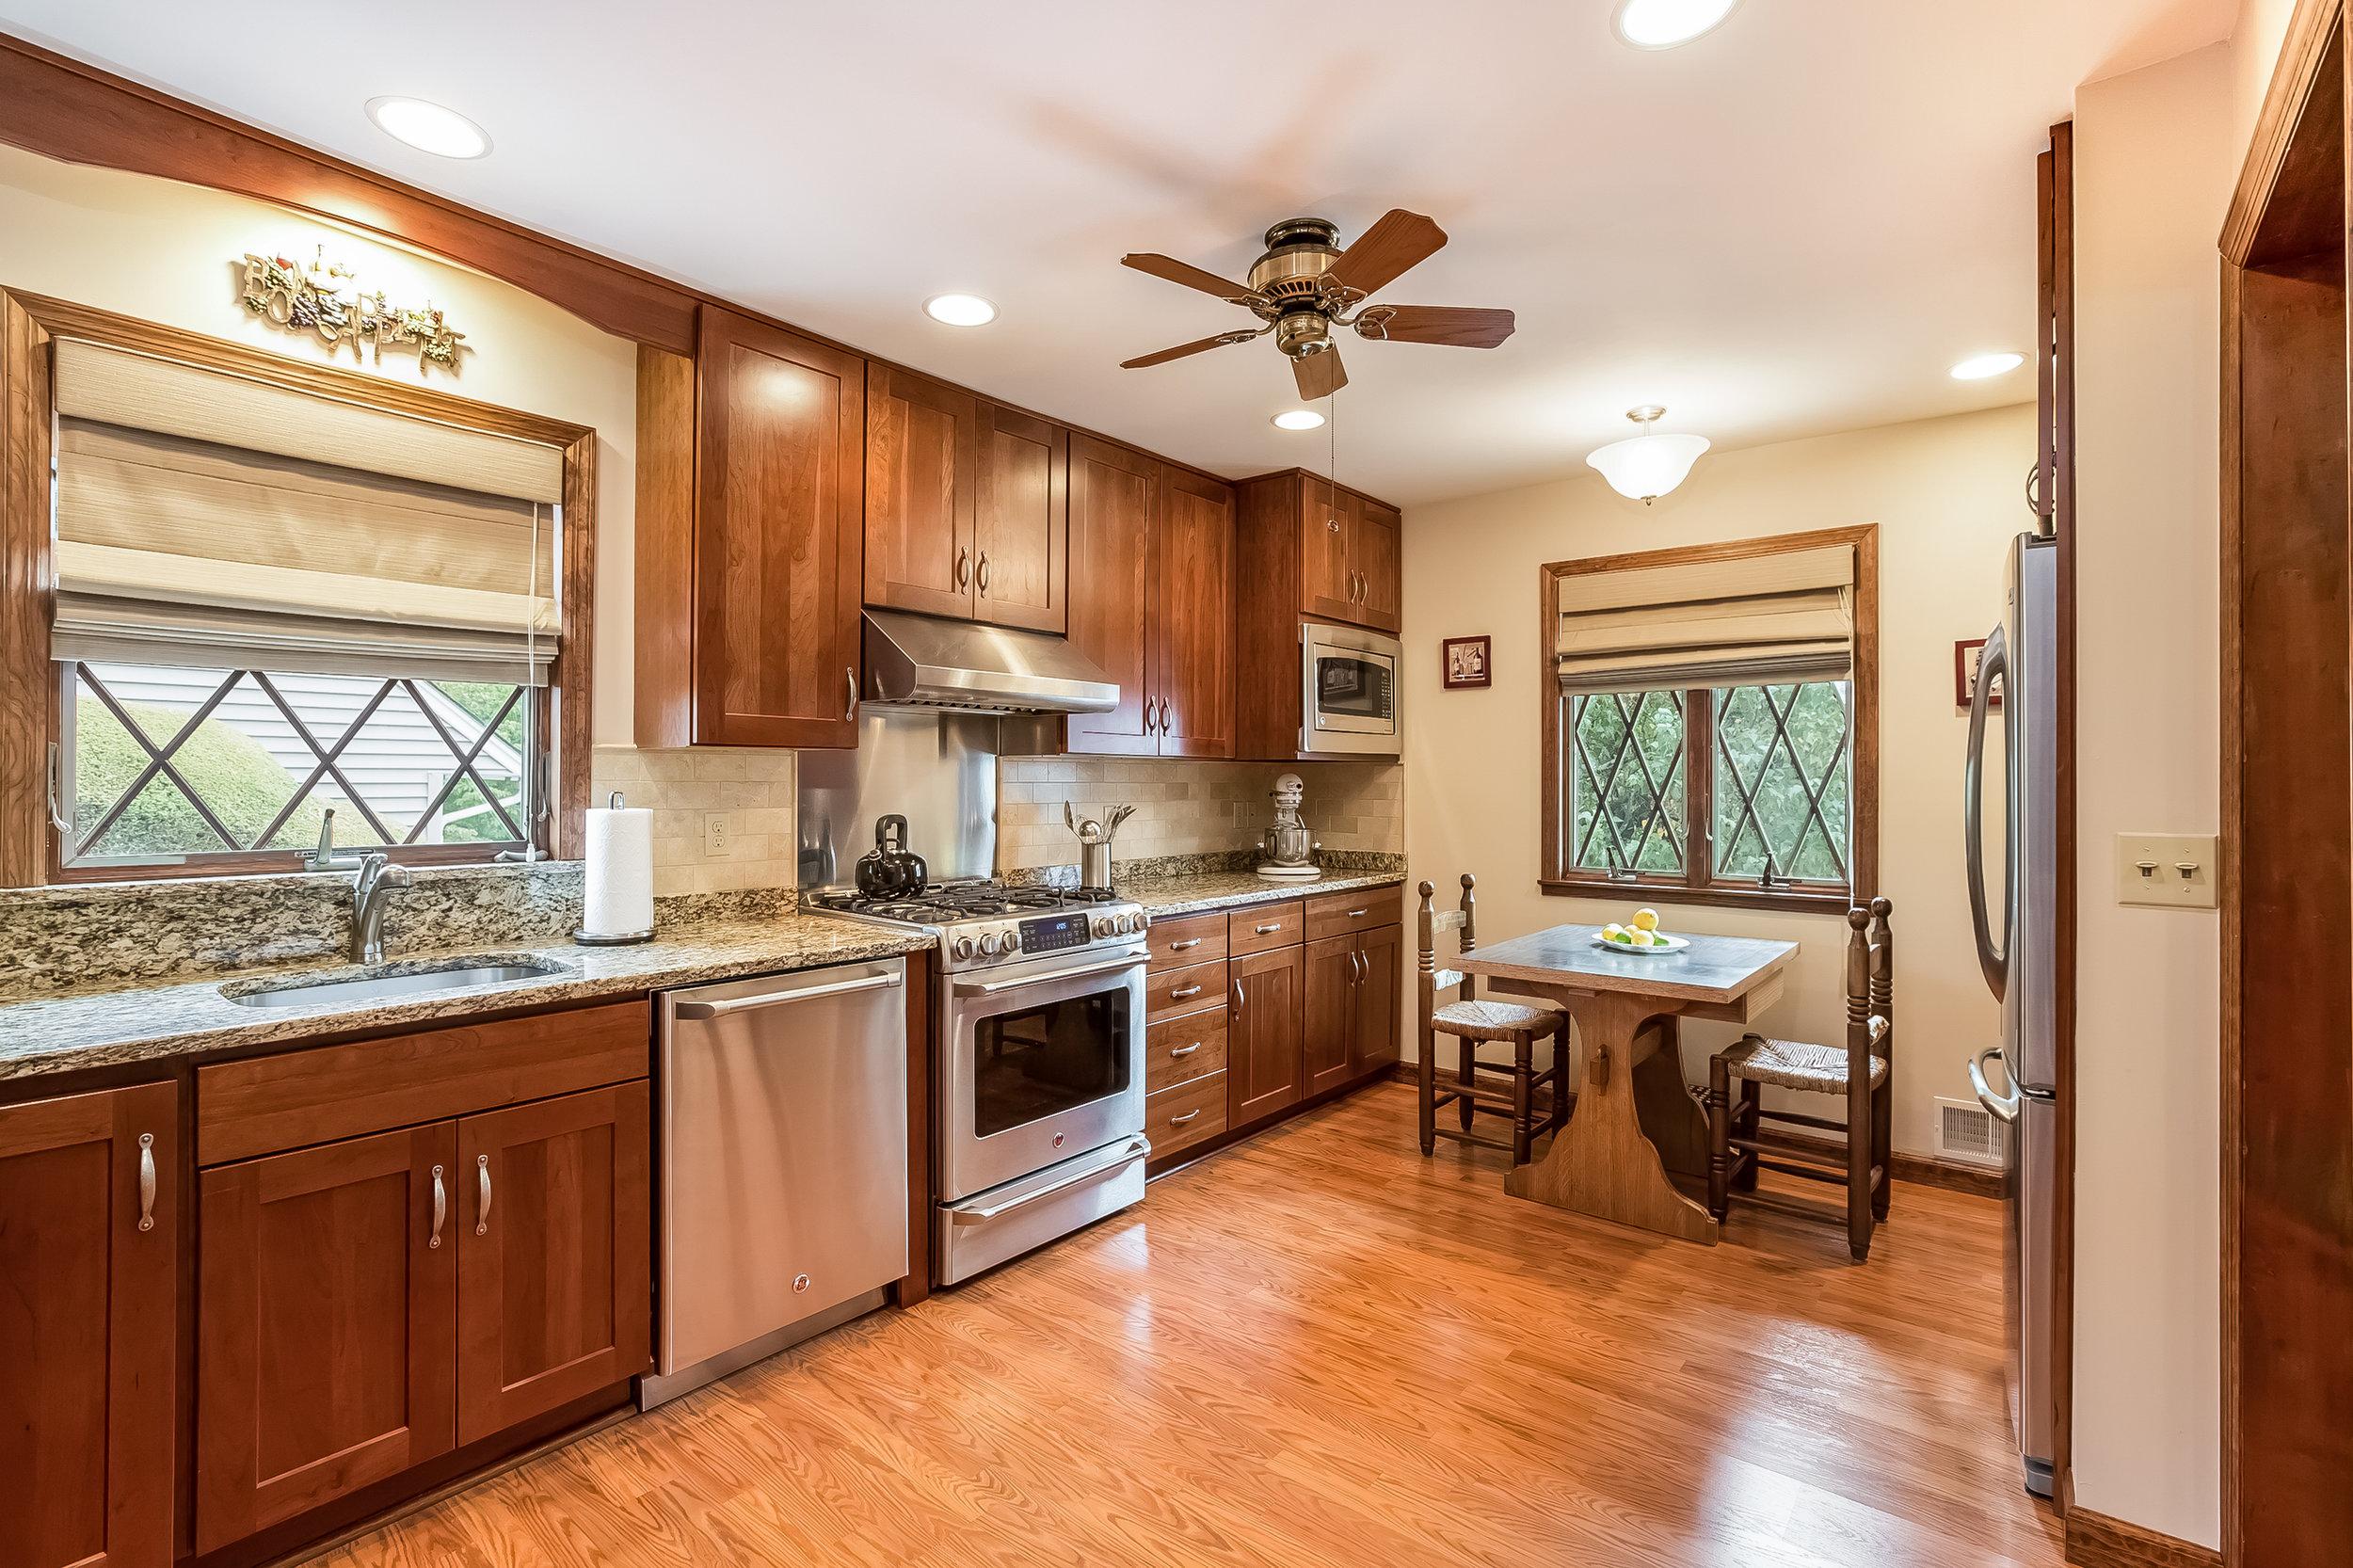 021-Kitchen-4932676-large.jpg